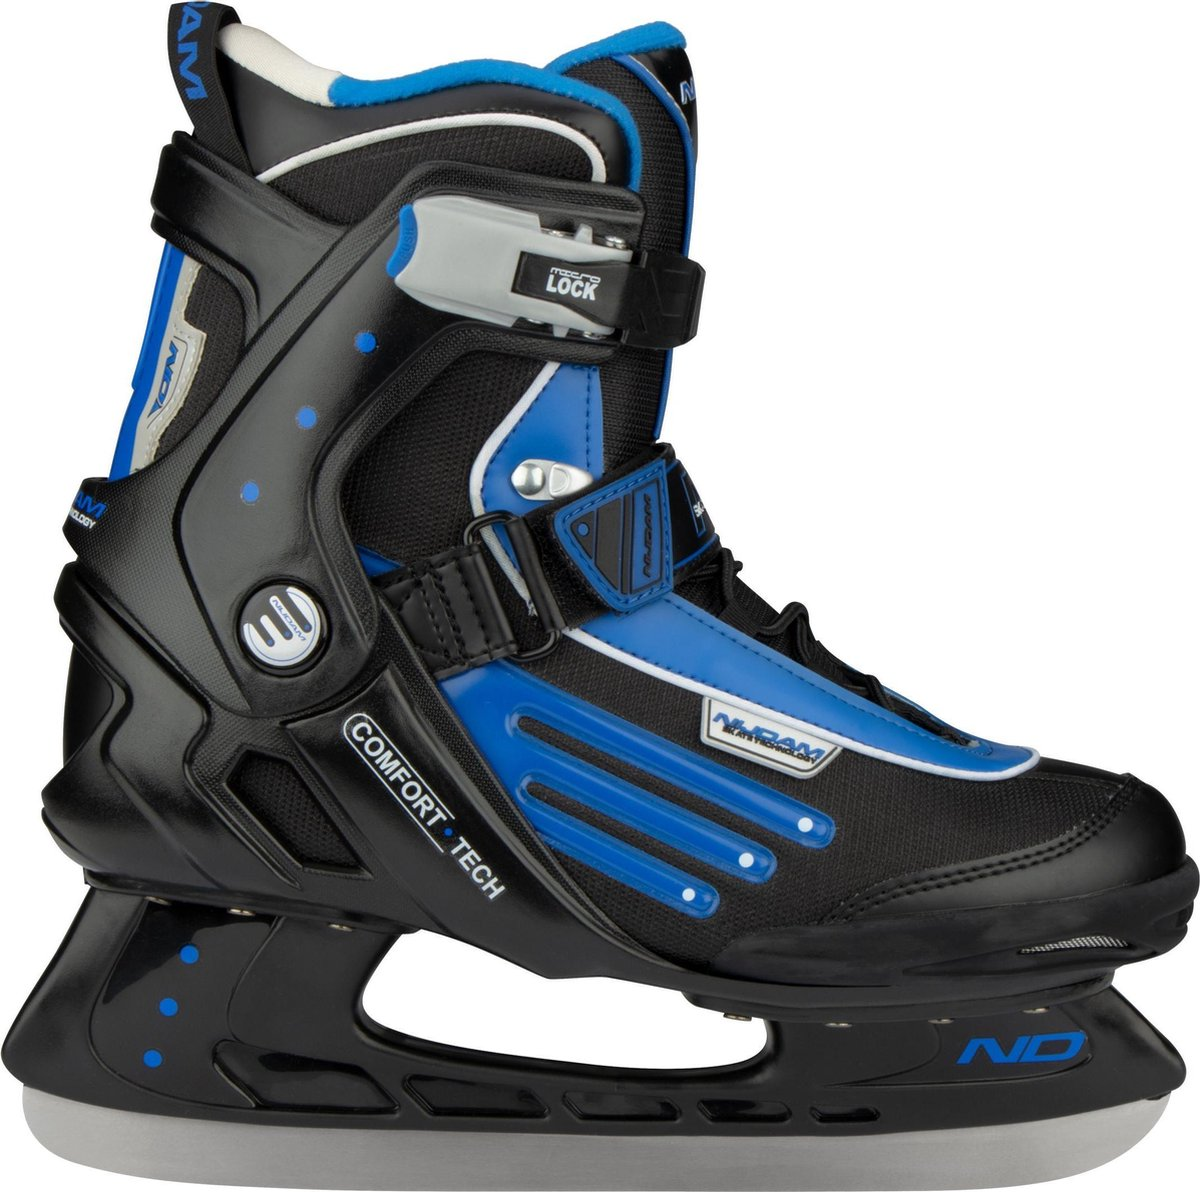 Nijdam IJshockeyschaats - Semi-Softboot - Zwart/Blauw/Zilver - 38